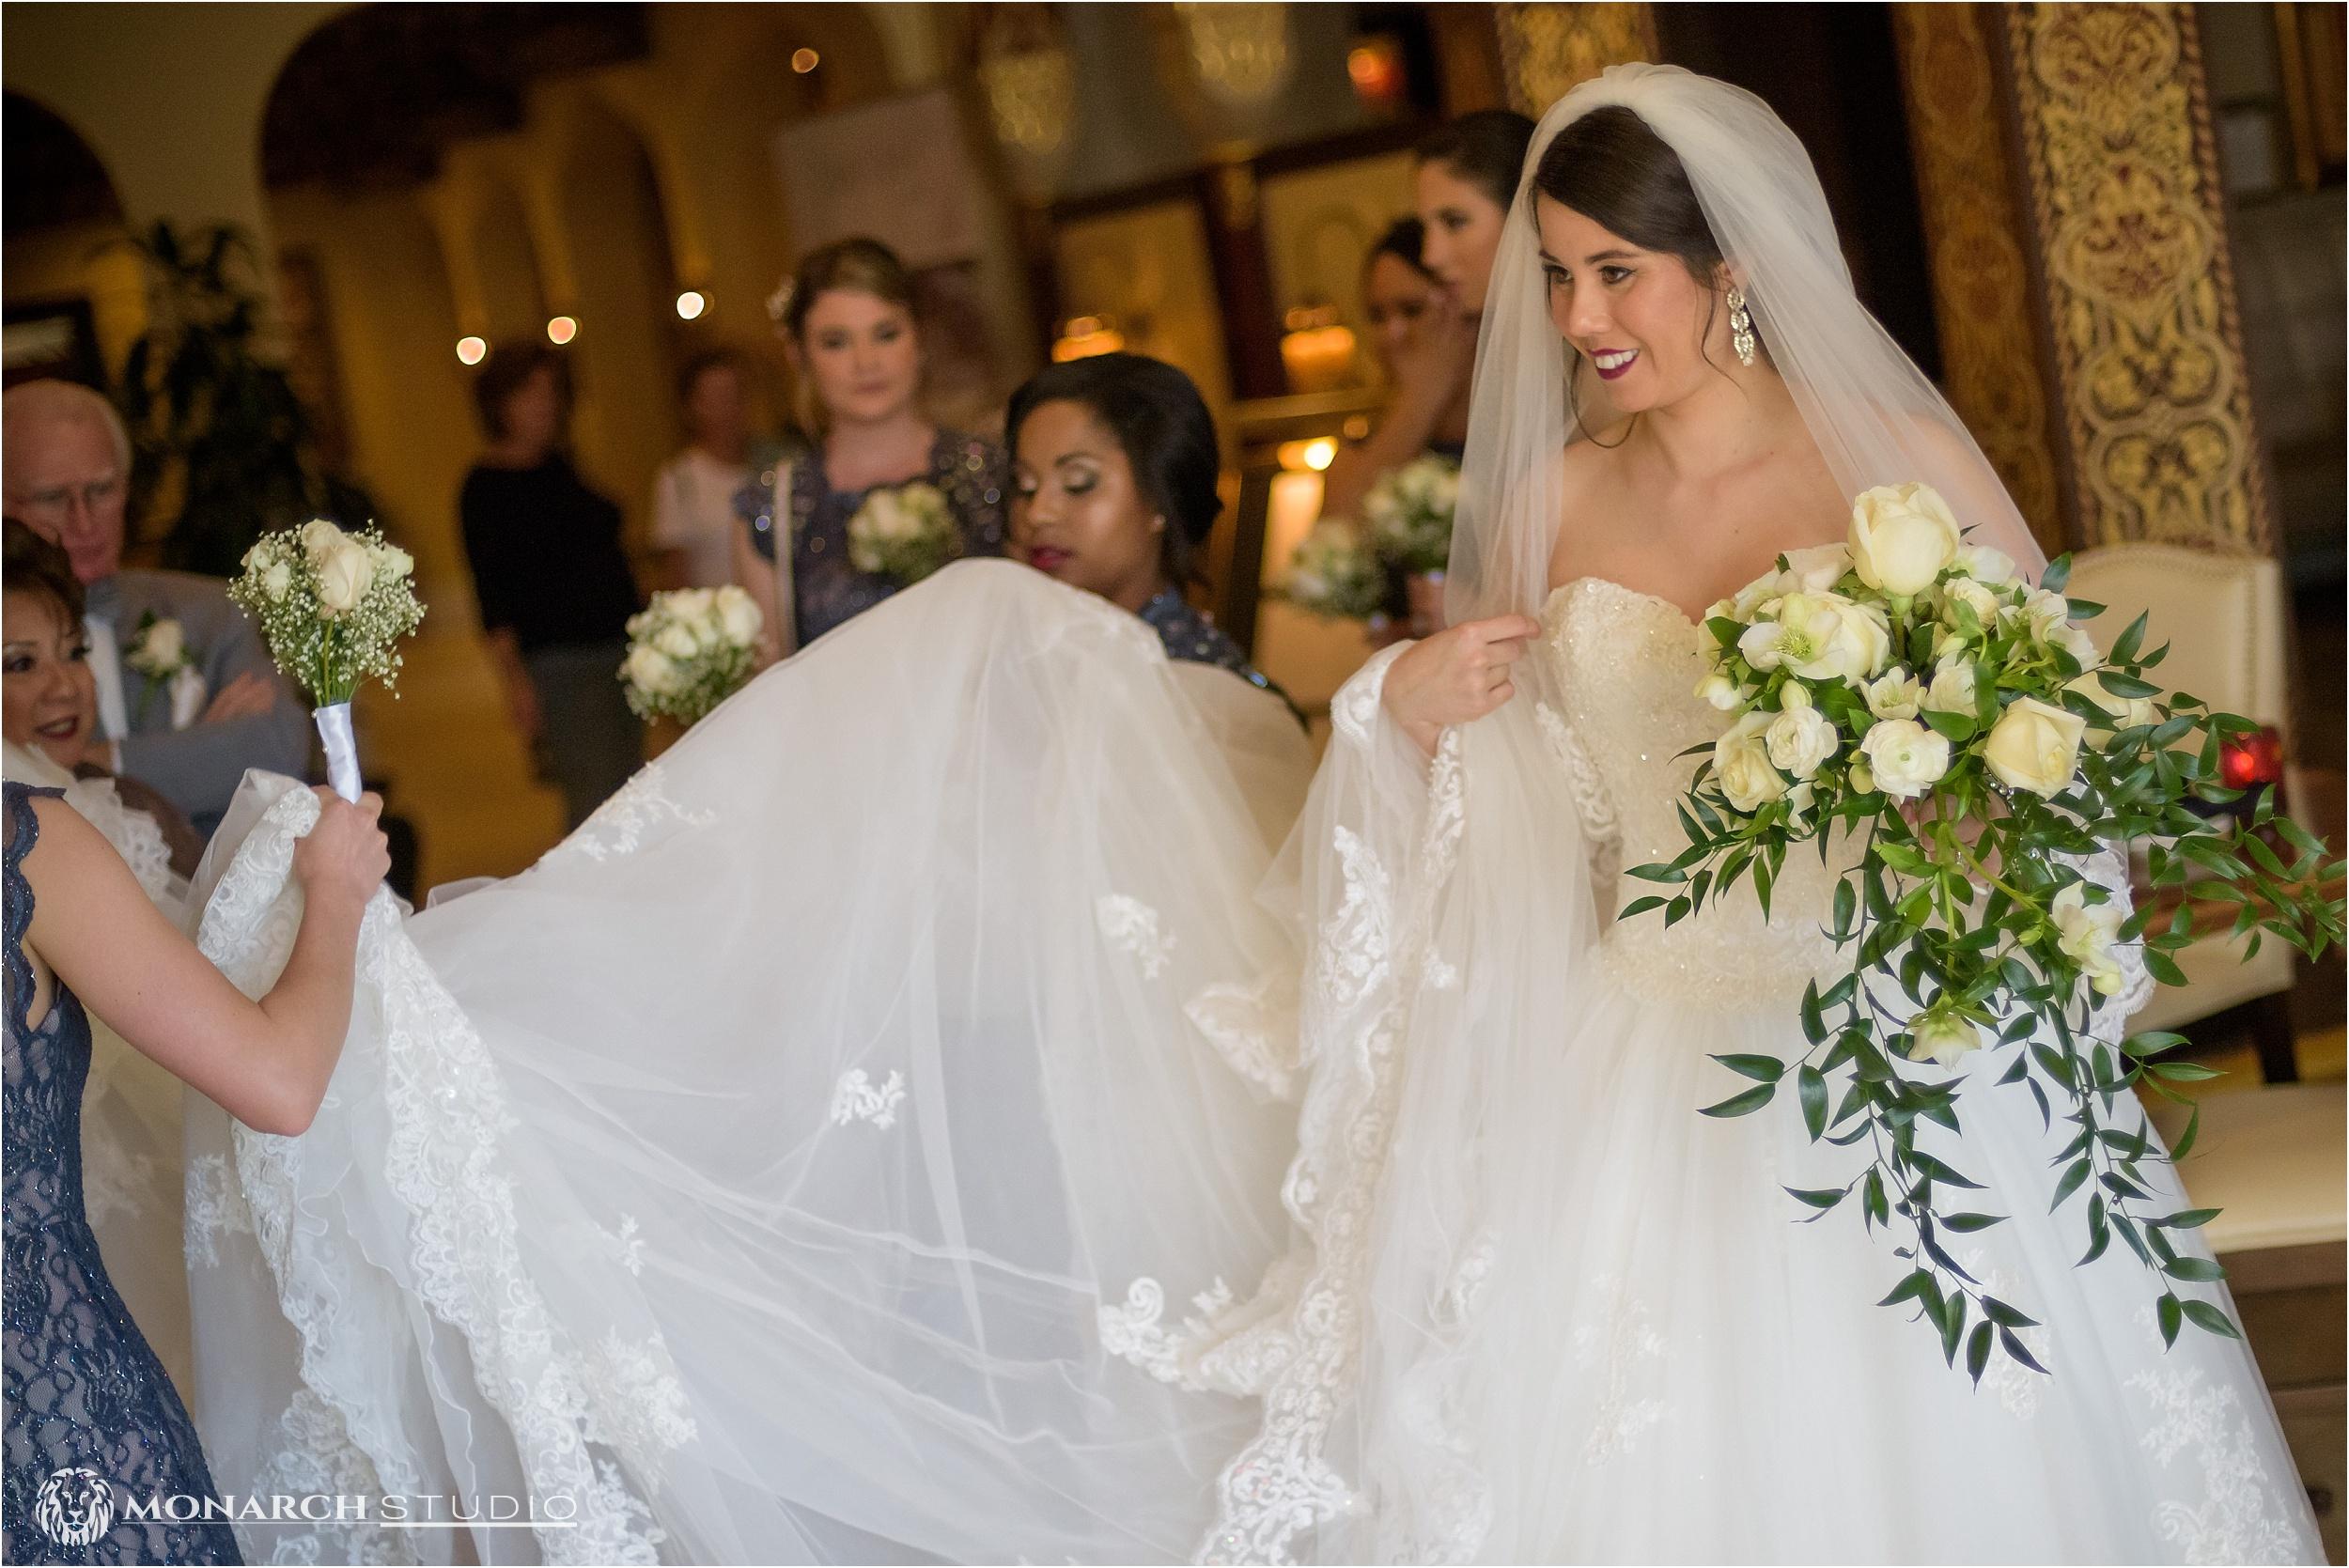 wedding-photographer-in-st-augustine-florida-treasury-020.jpg